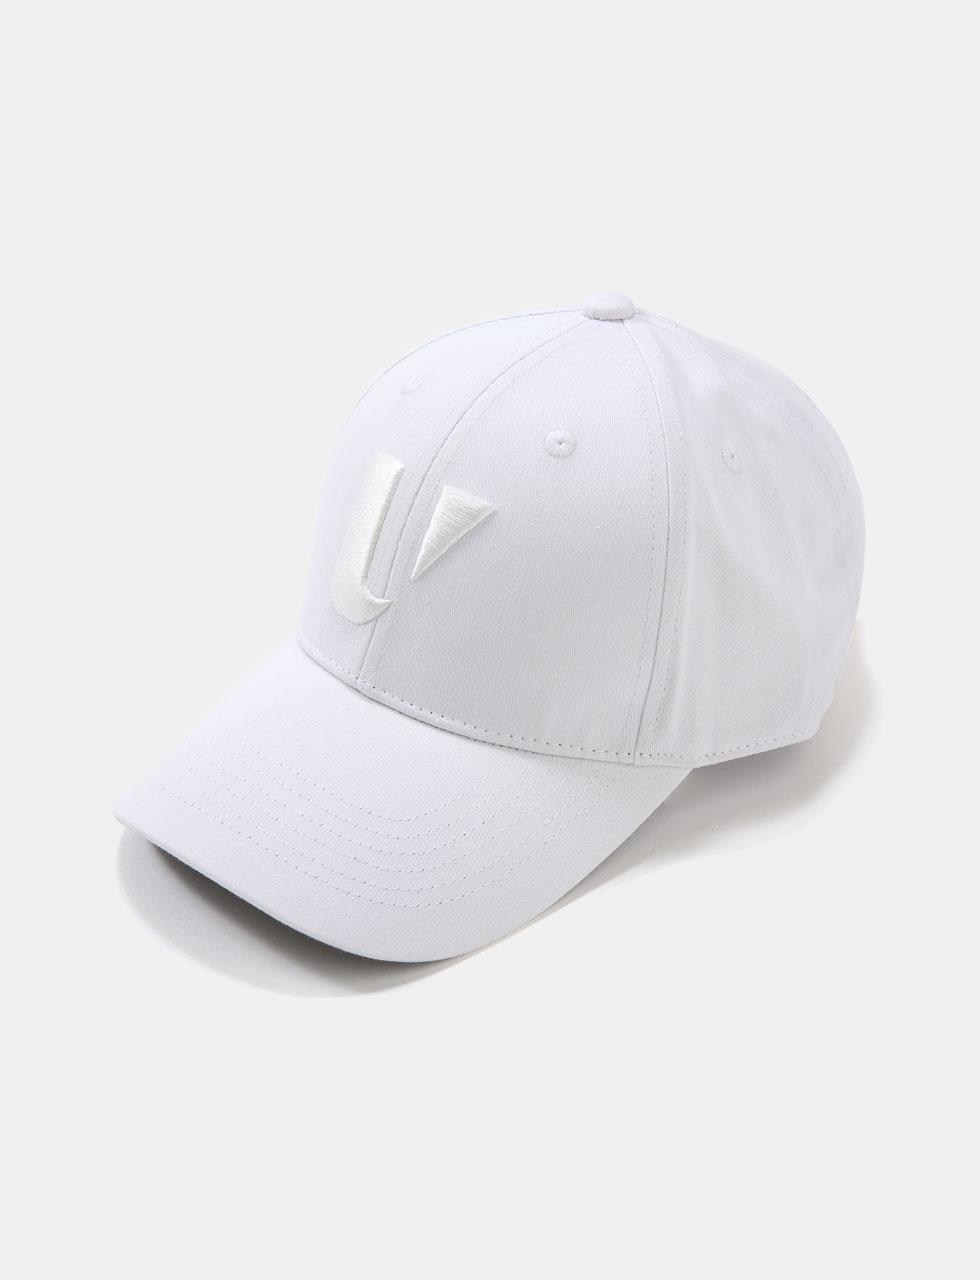 6Pack Basic Cap